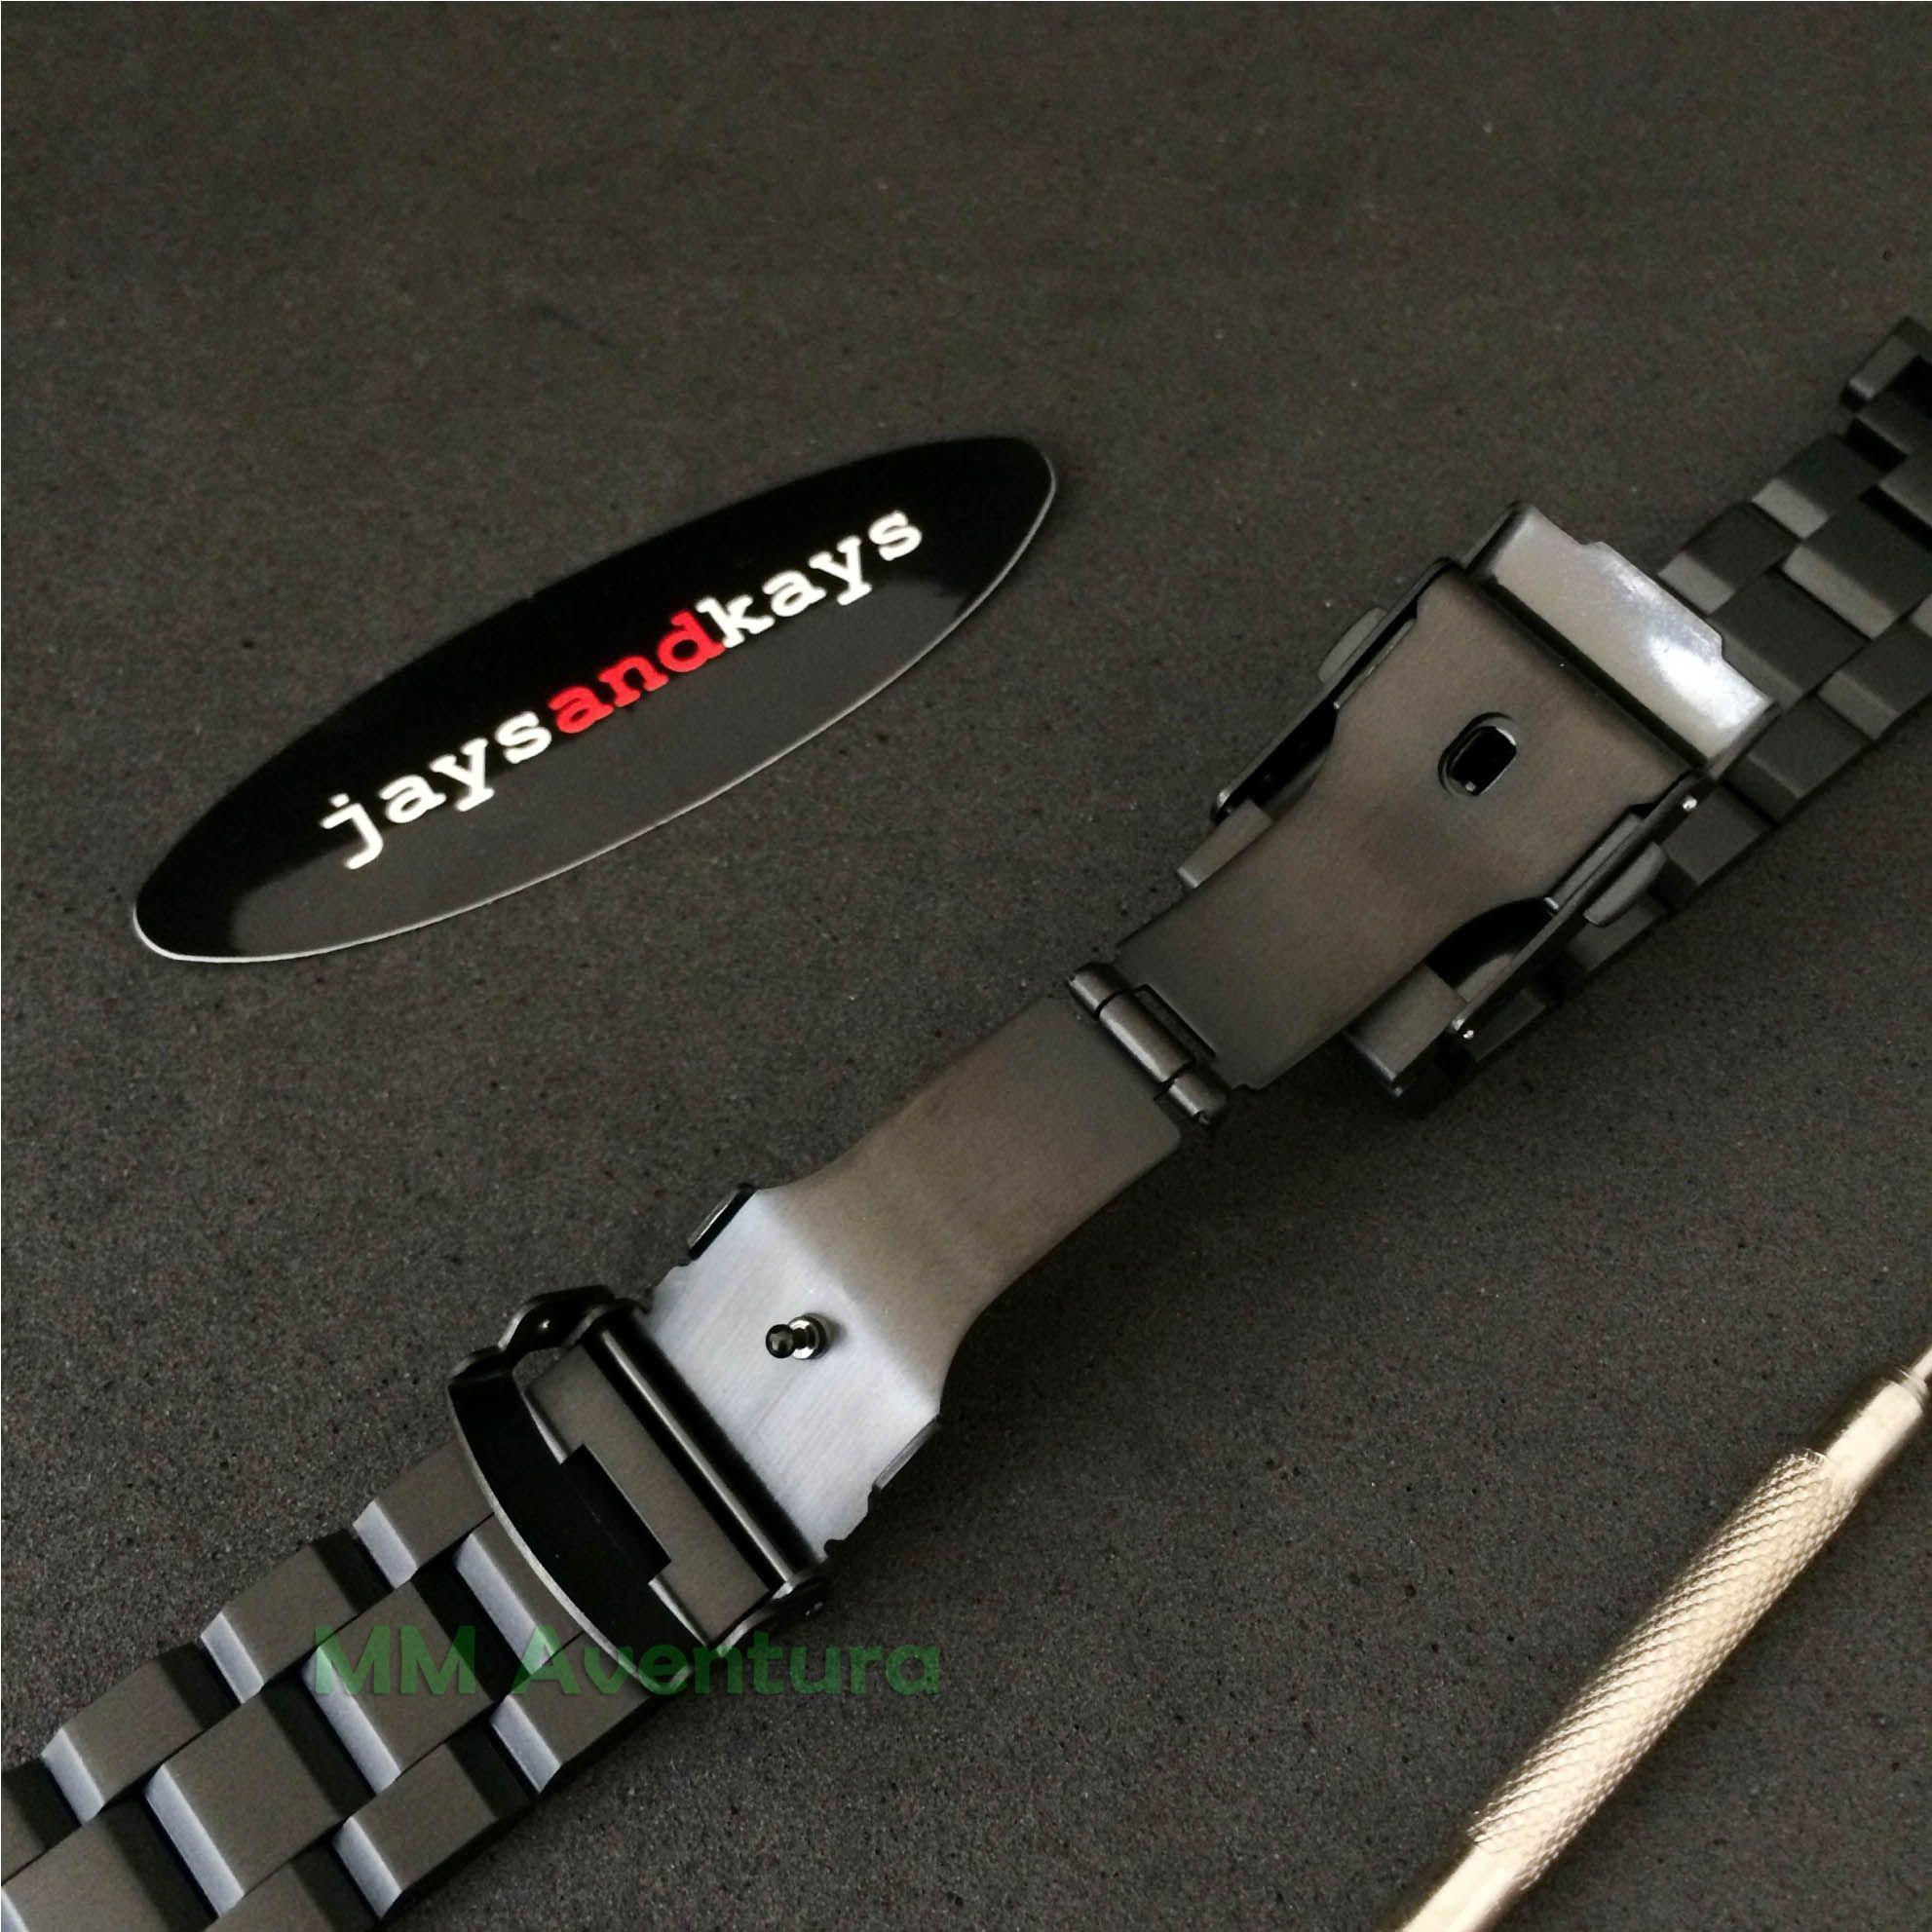 Pulseira em Aço Inox JaysAndKays p/ G-Shock 22mm GX56 GD350 GA100 etc